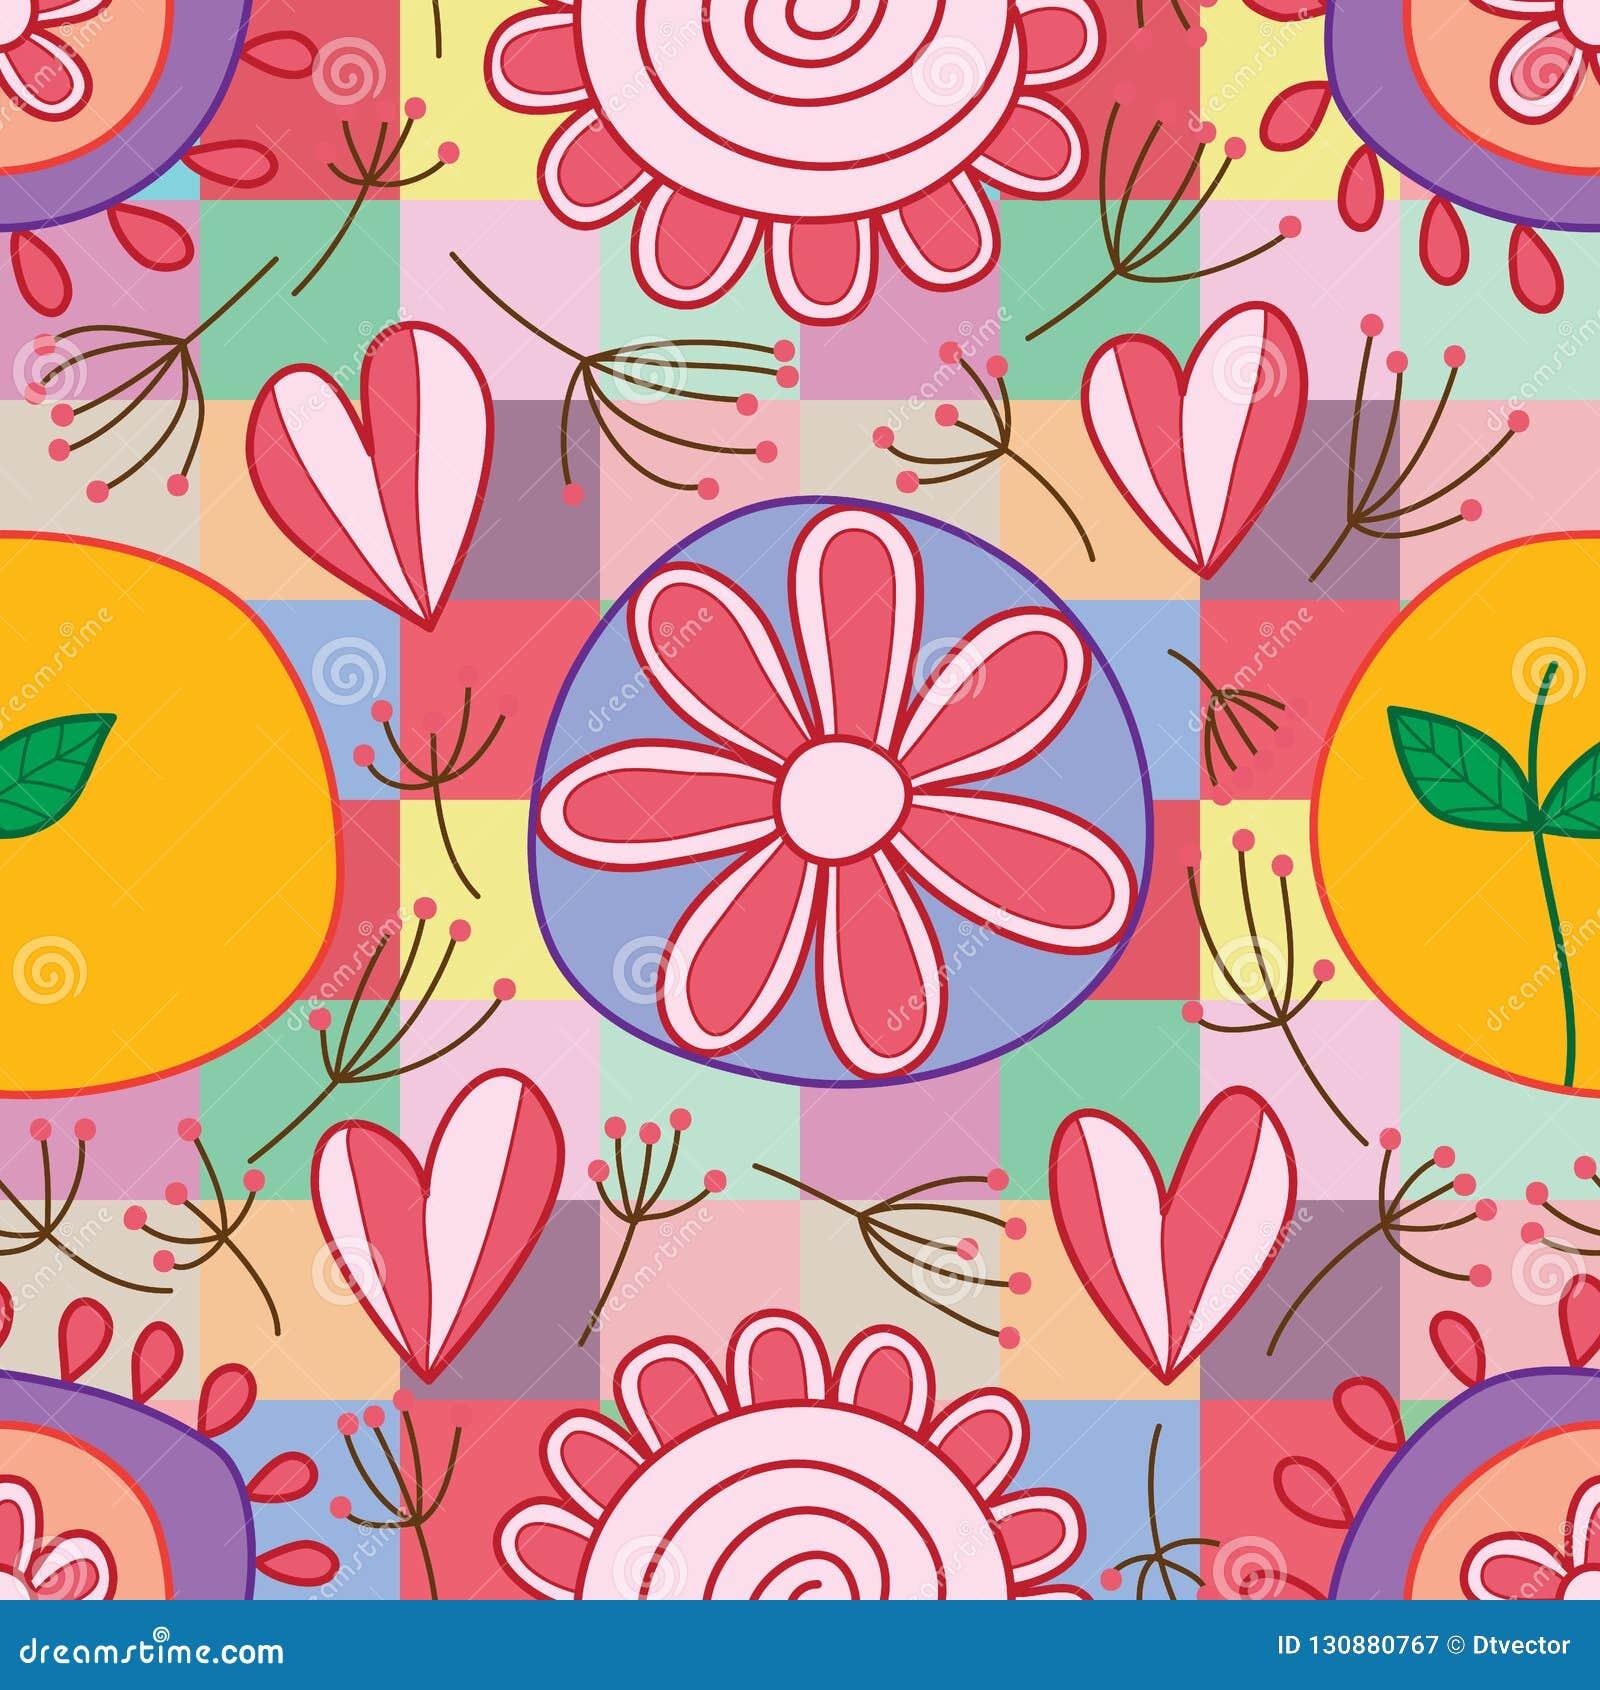 Flower love leaf dandelion round square style seamless pattern